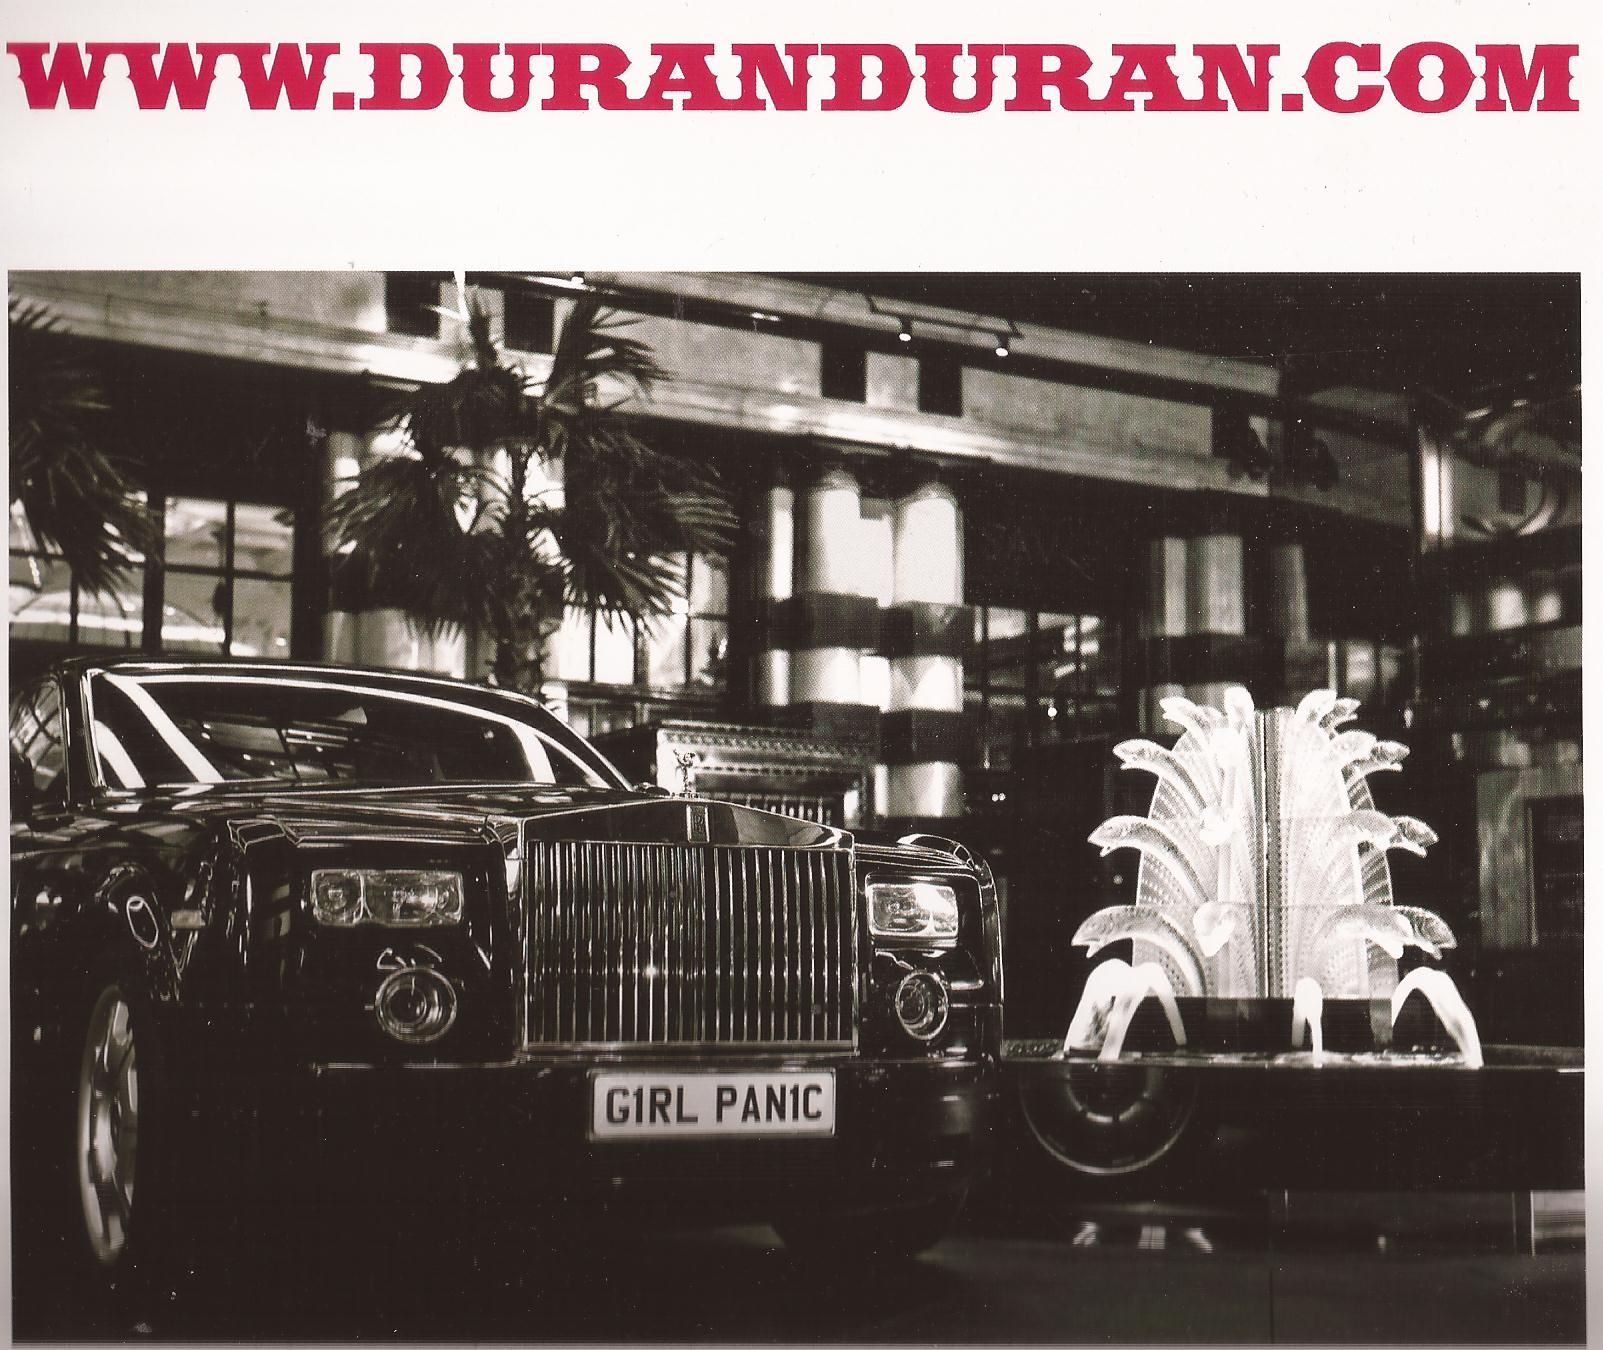 Duran Duran 2012 Calendar | Duran Duran | Pinterest